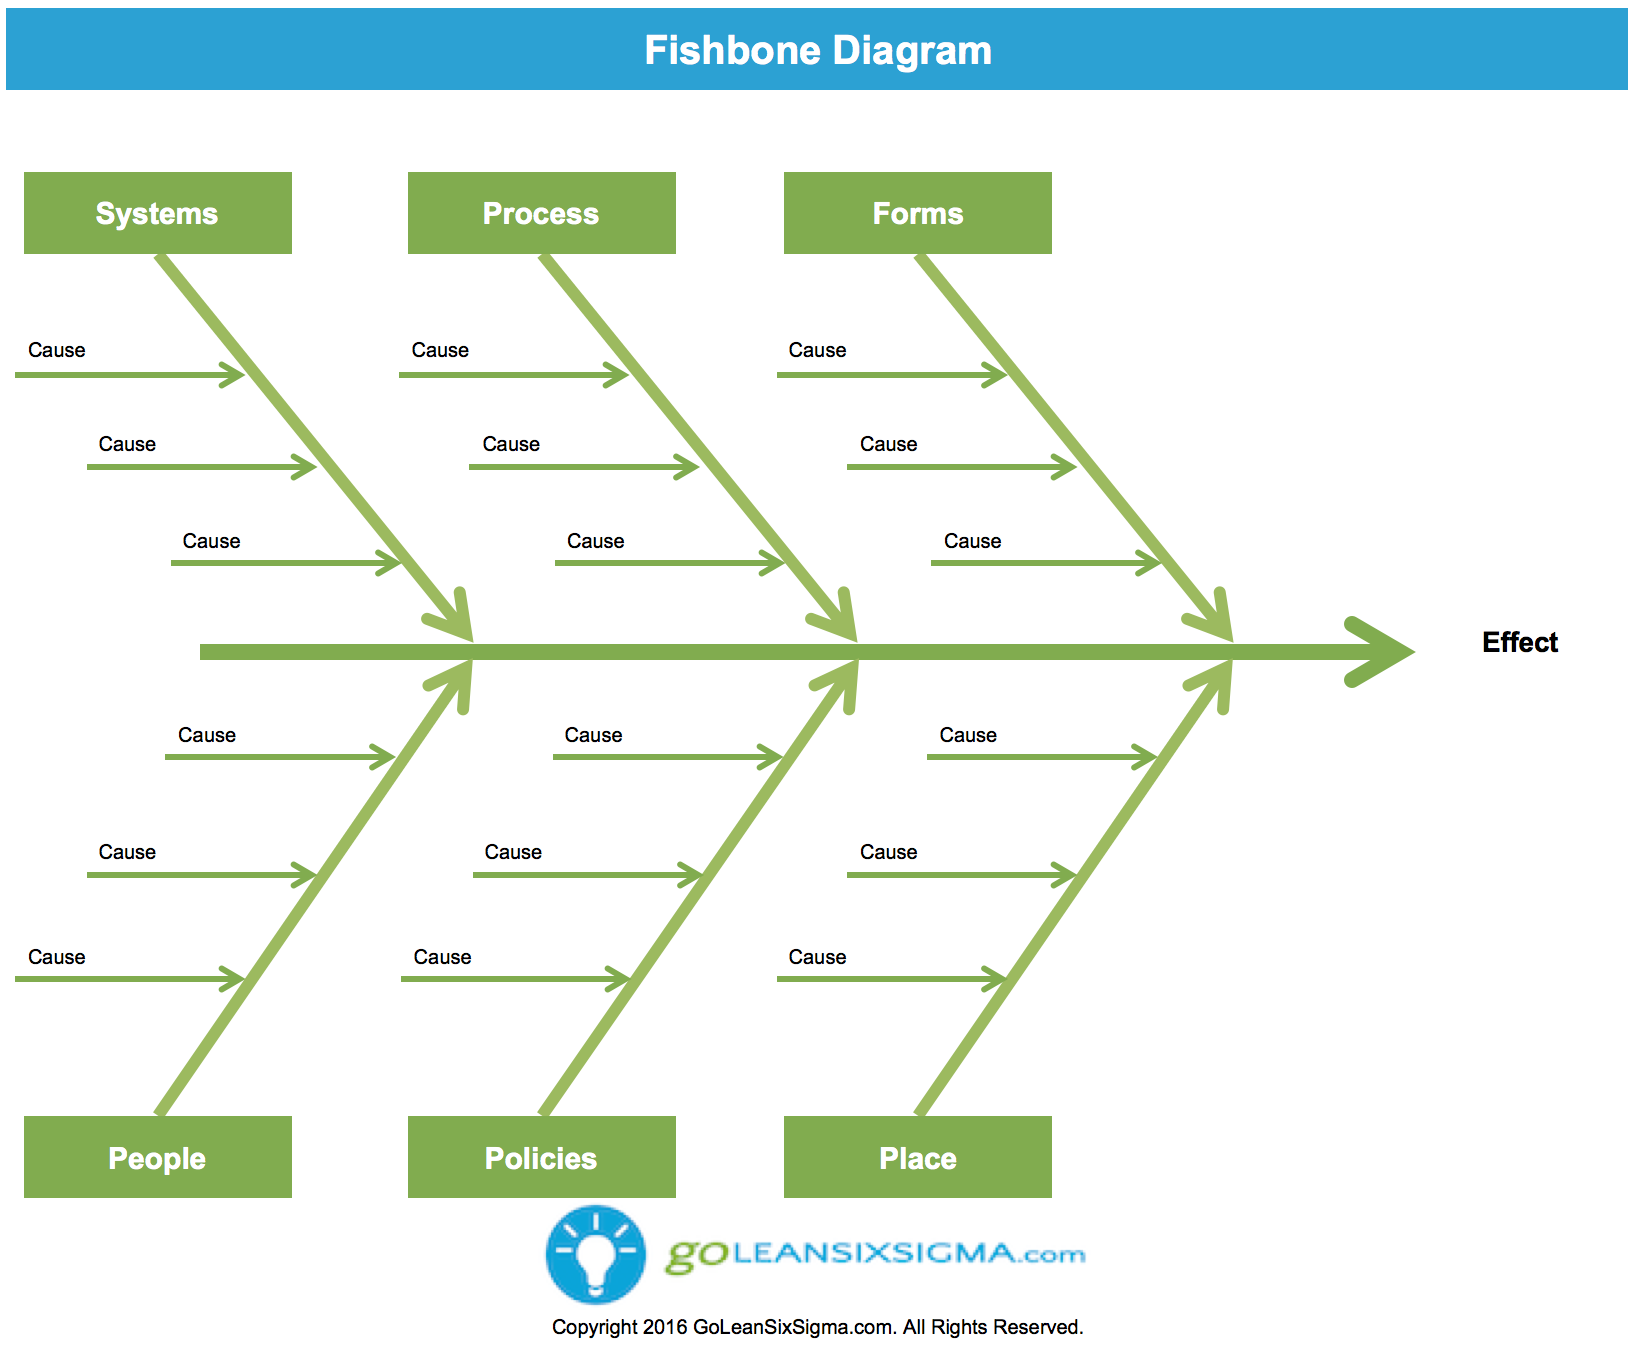 medium resolution of fishbone diagram or cause effect diagram template example